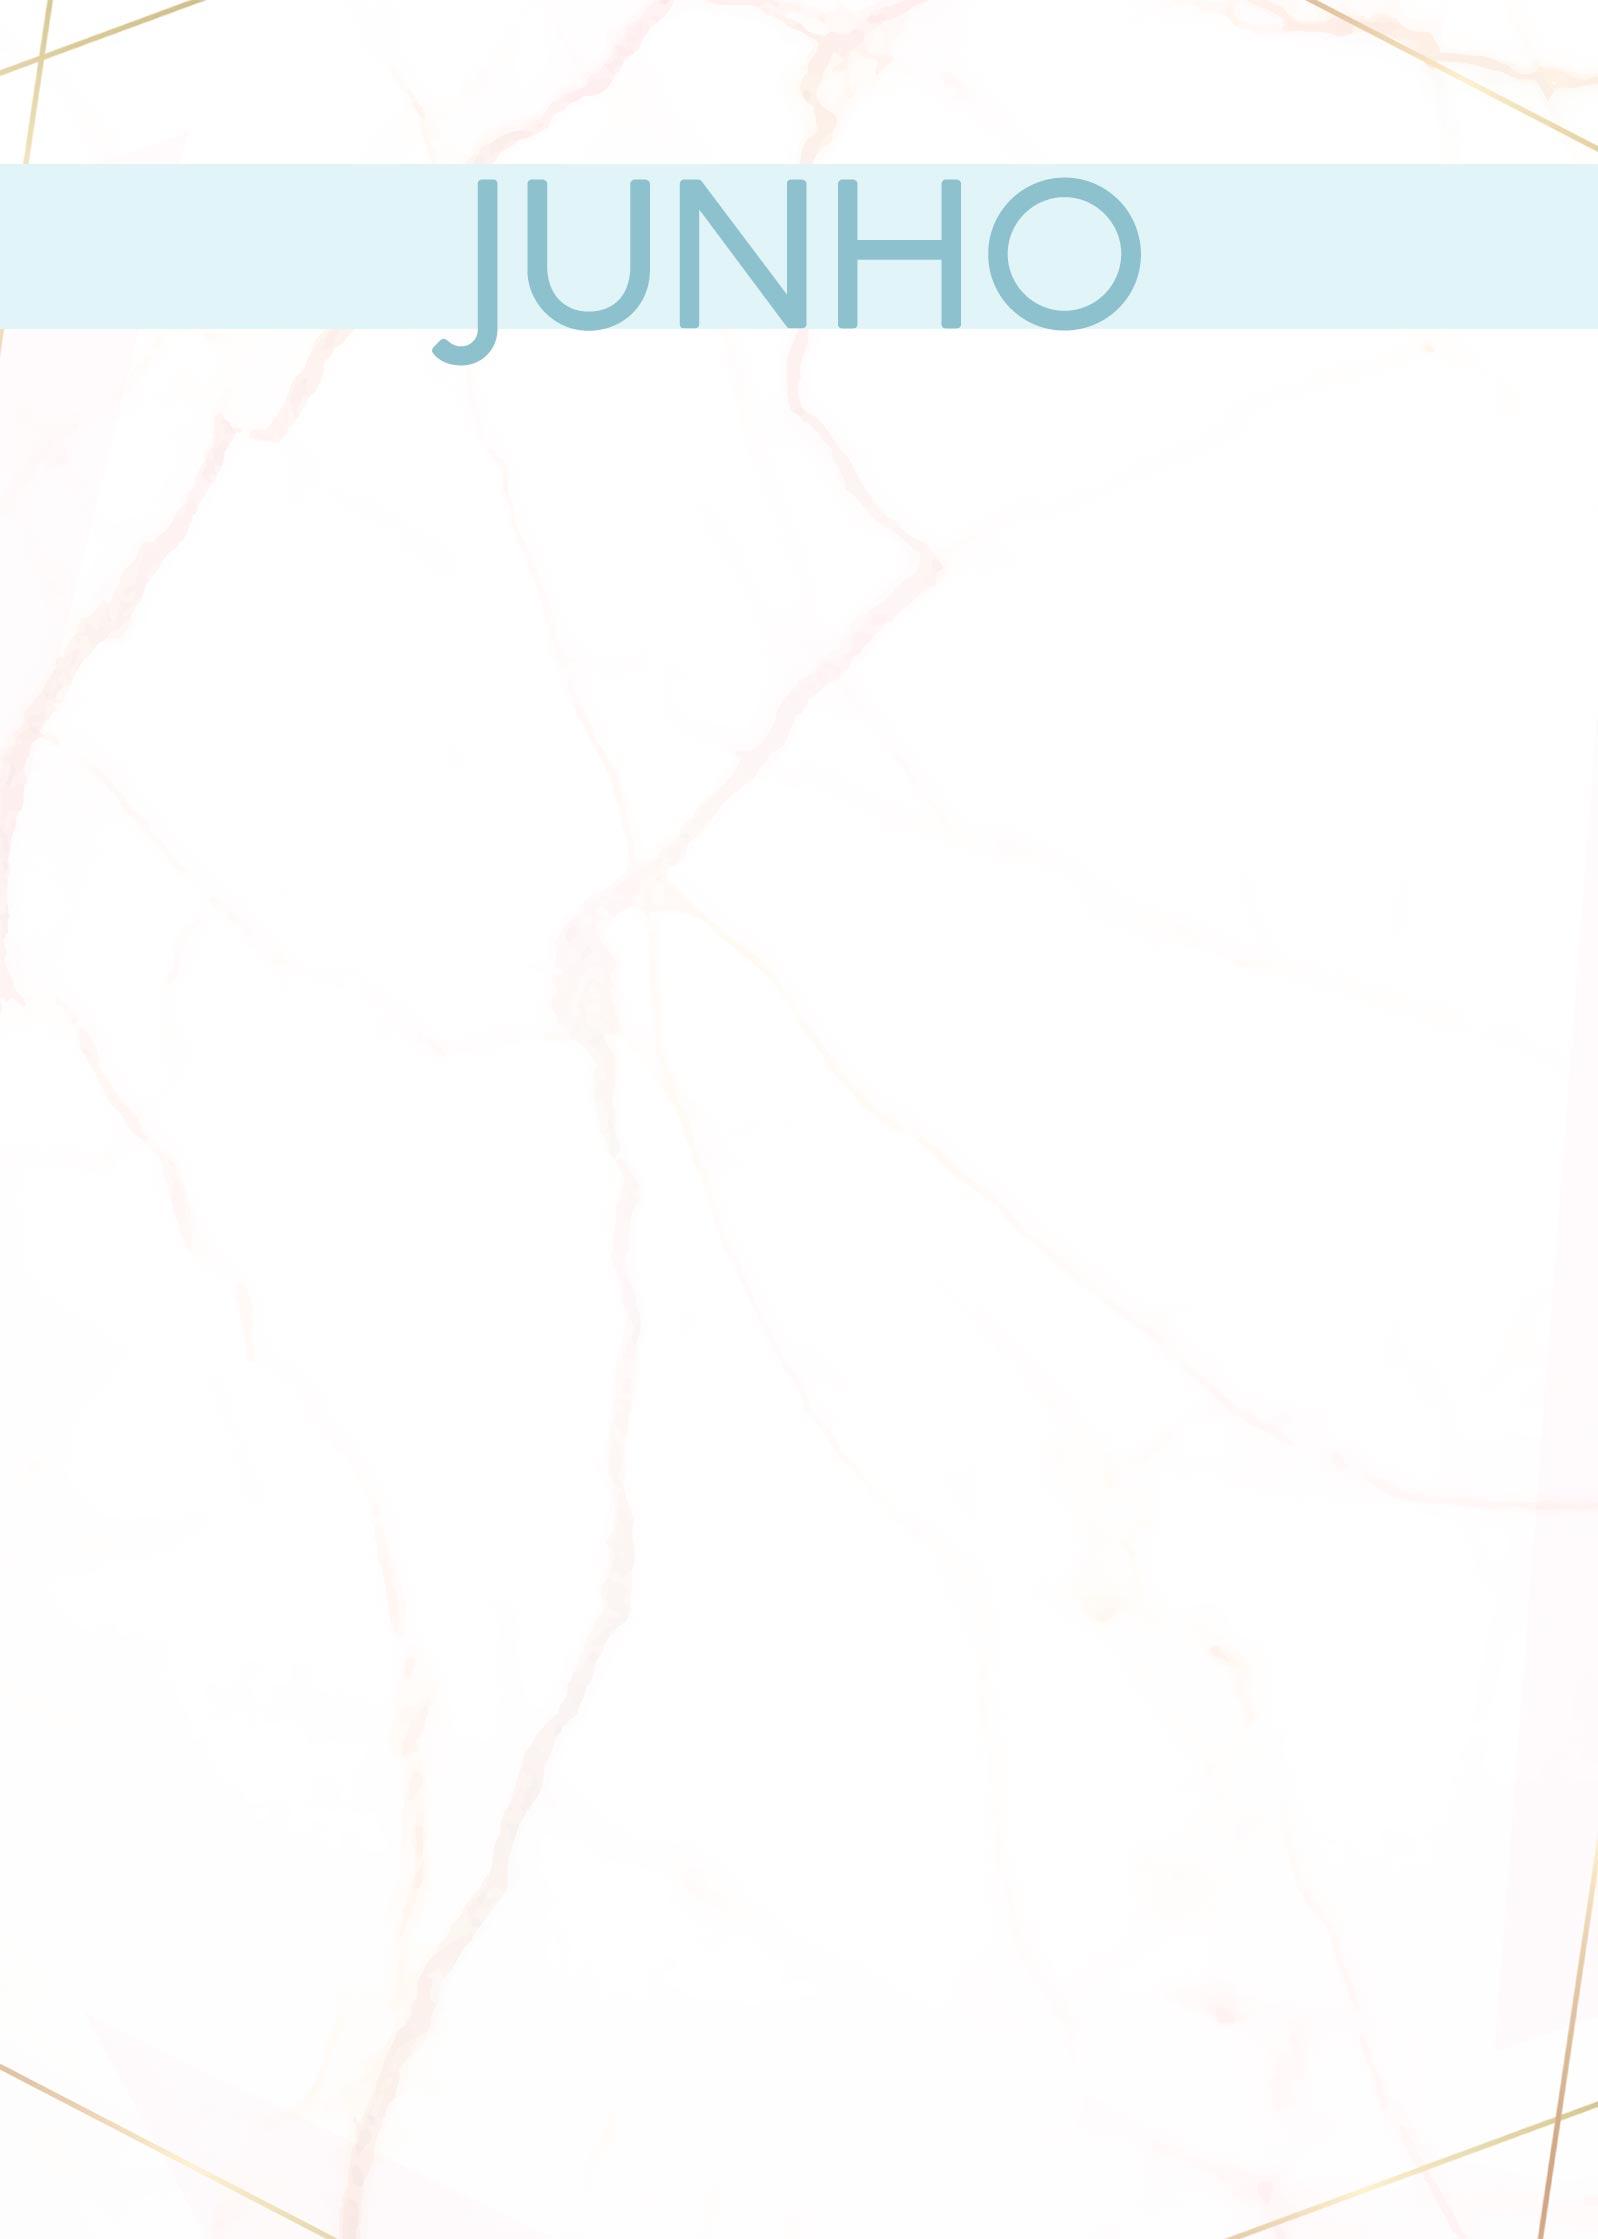 Planner Marmore capa junho